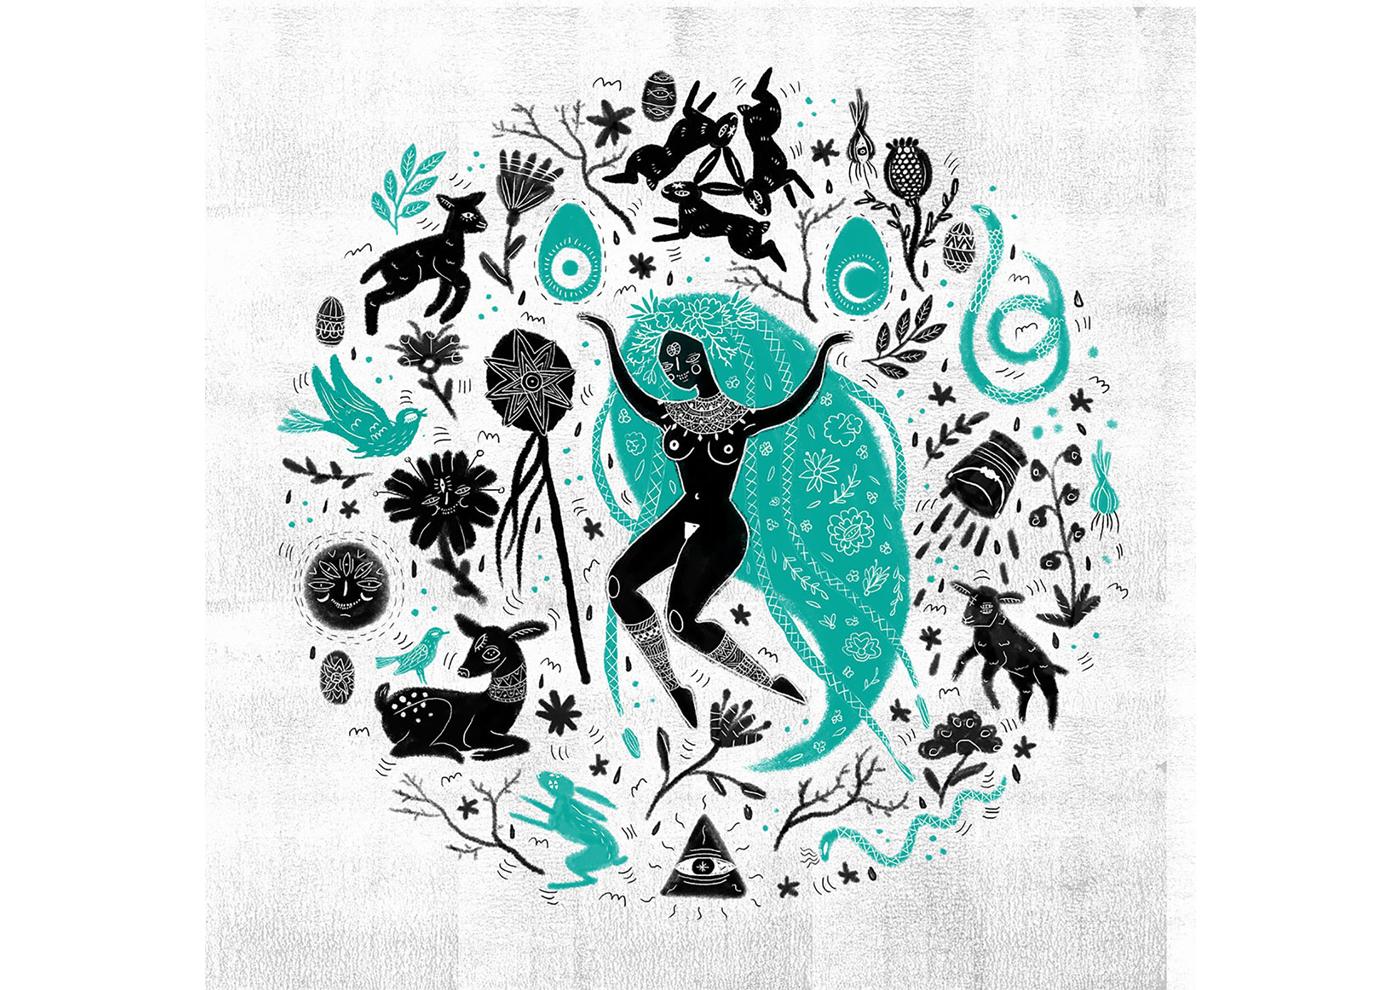 yule Winter Solstice Christmas pagan goddess Magic   constellation Wicca sabbat Halloween